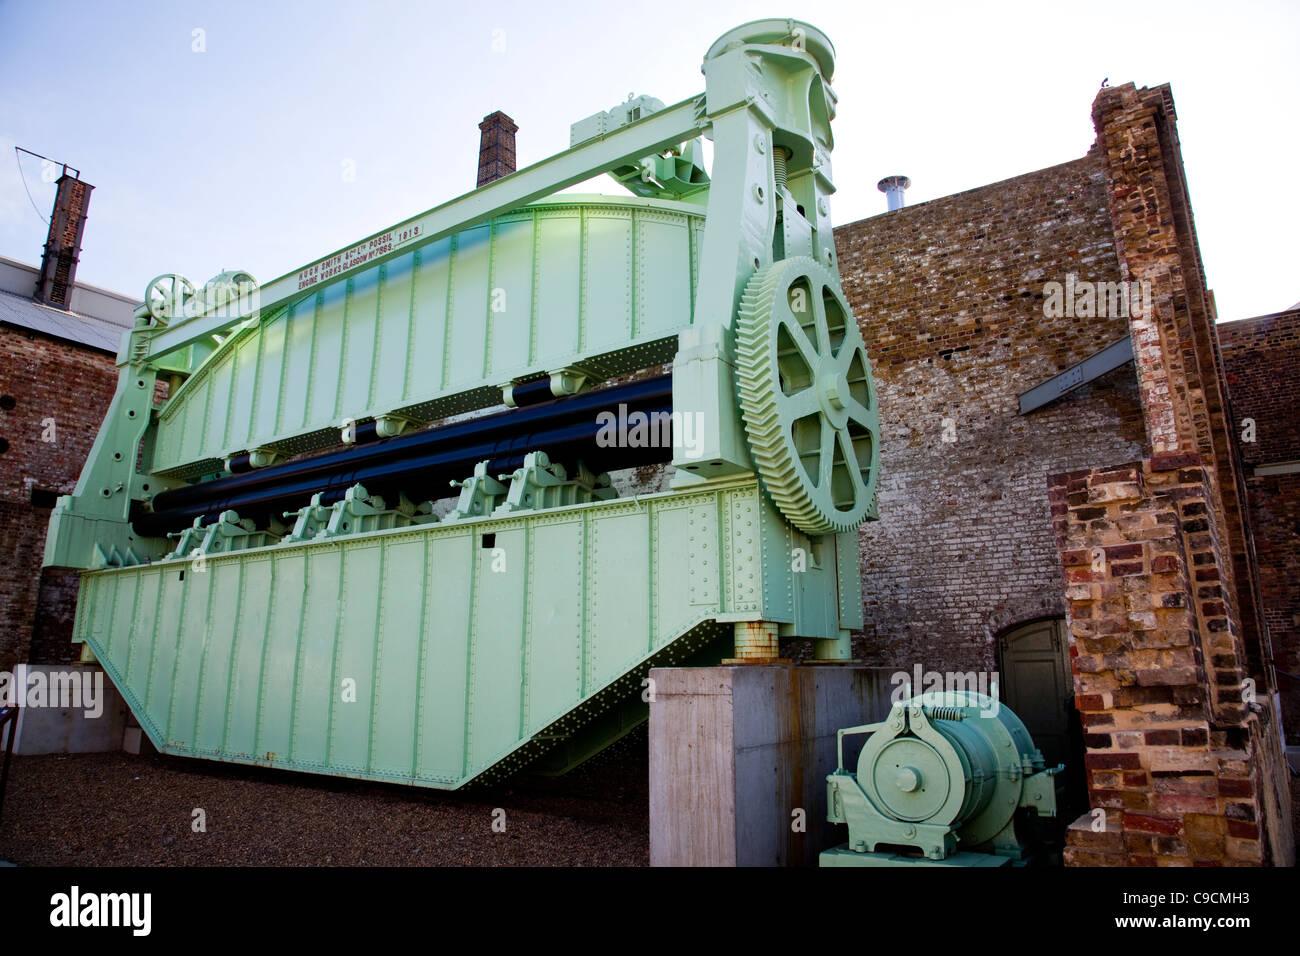 Gigantic plate bending roller - Stock Image